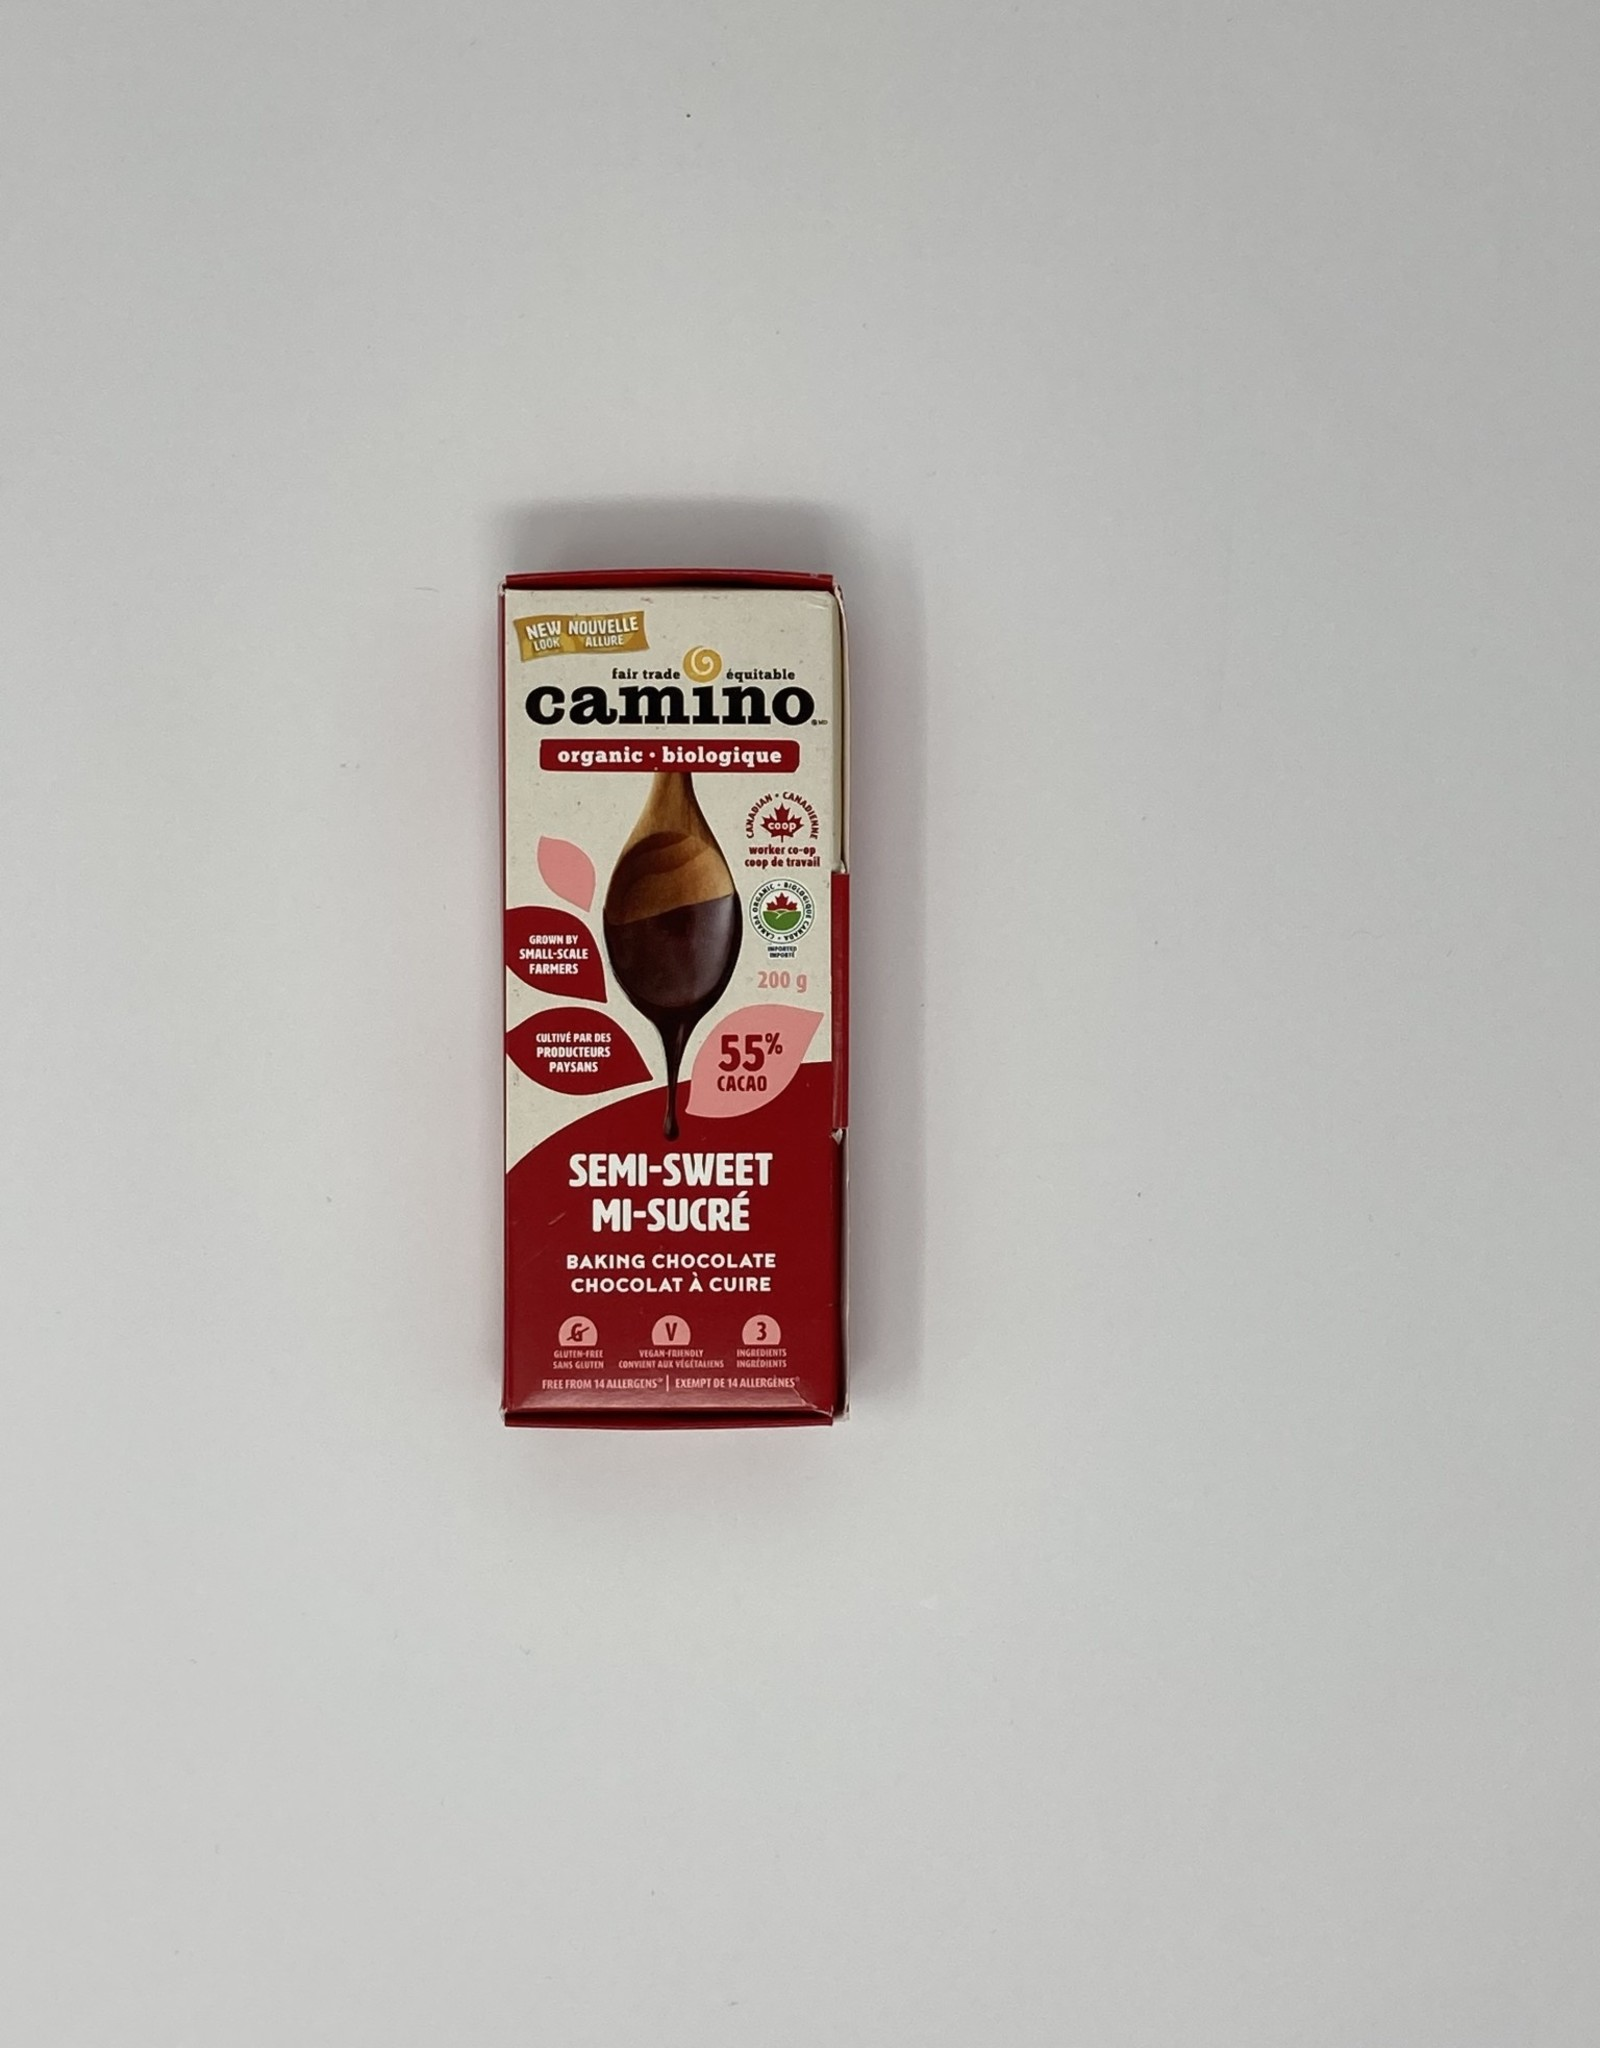 Camino Camino - Baking Chocolate 55%